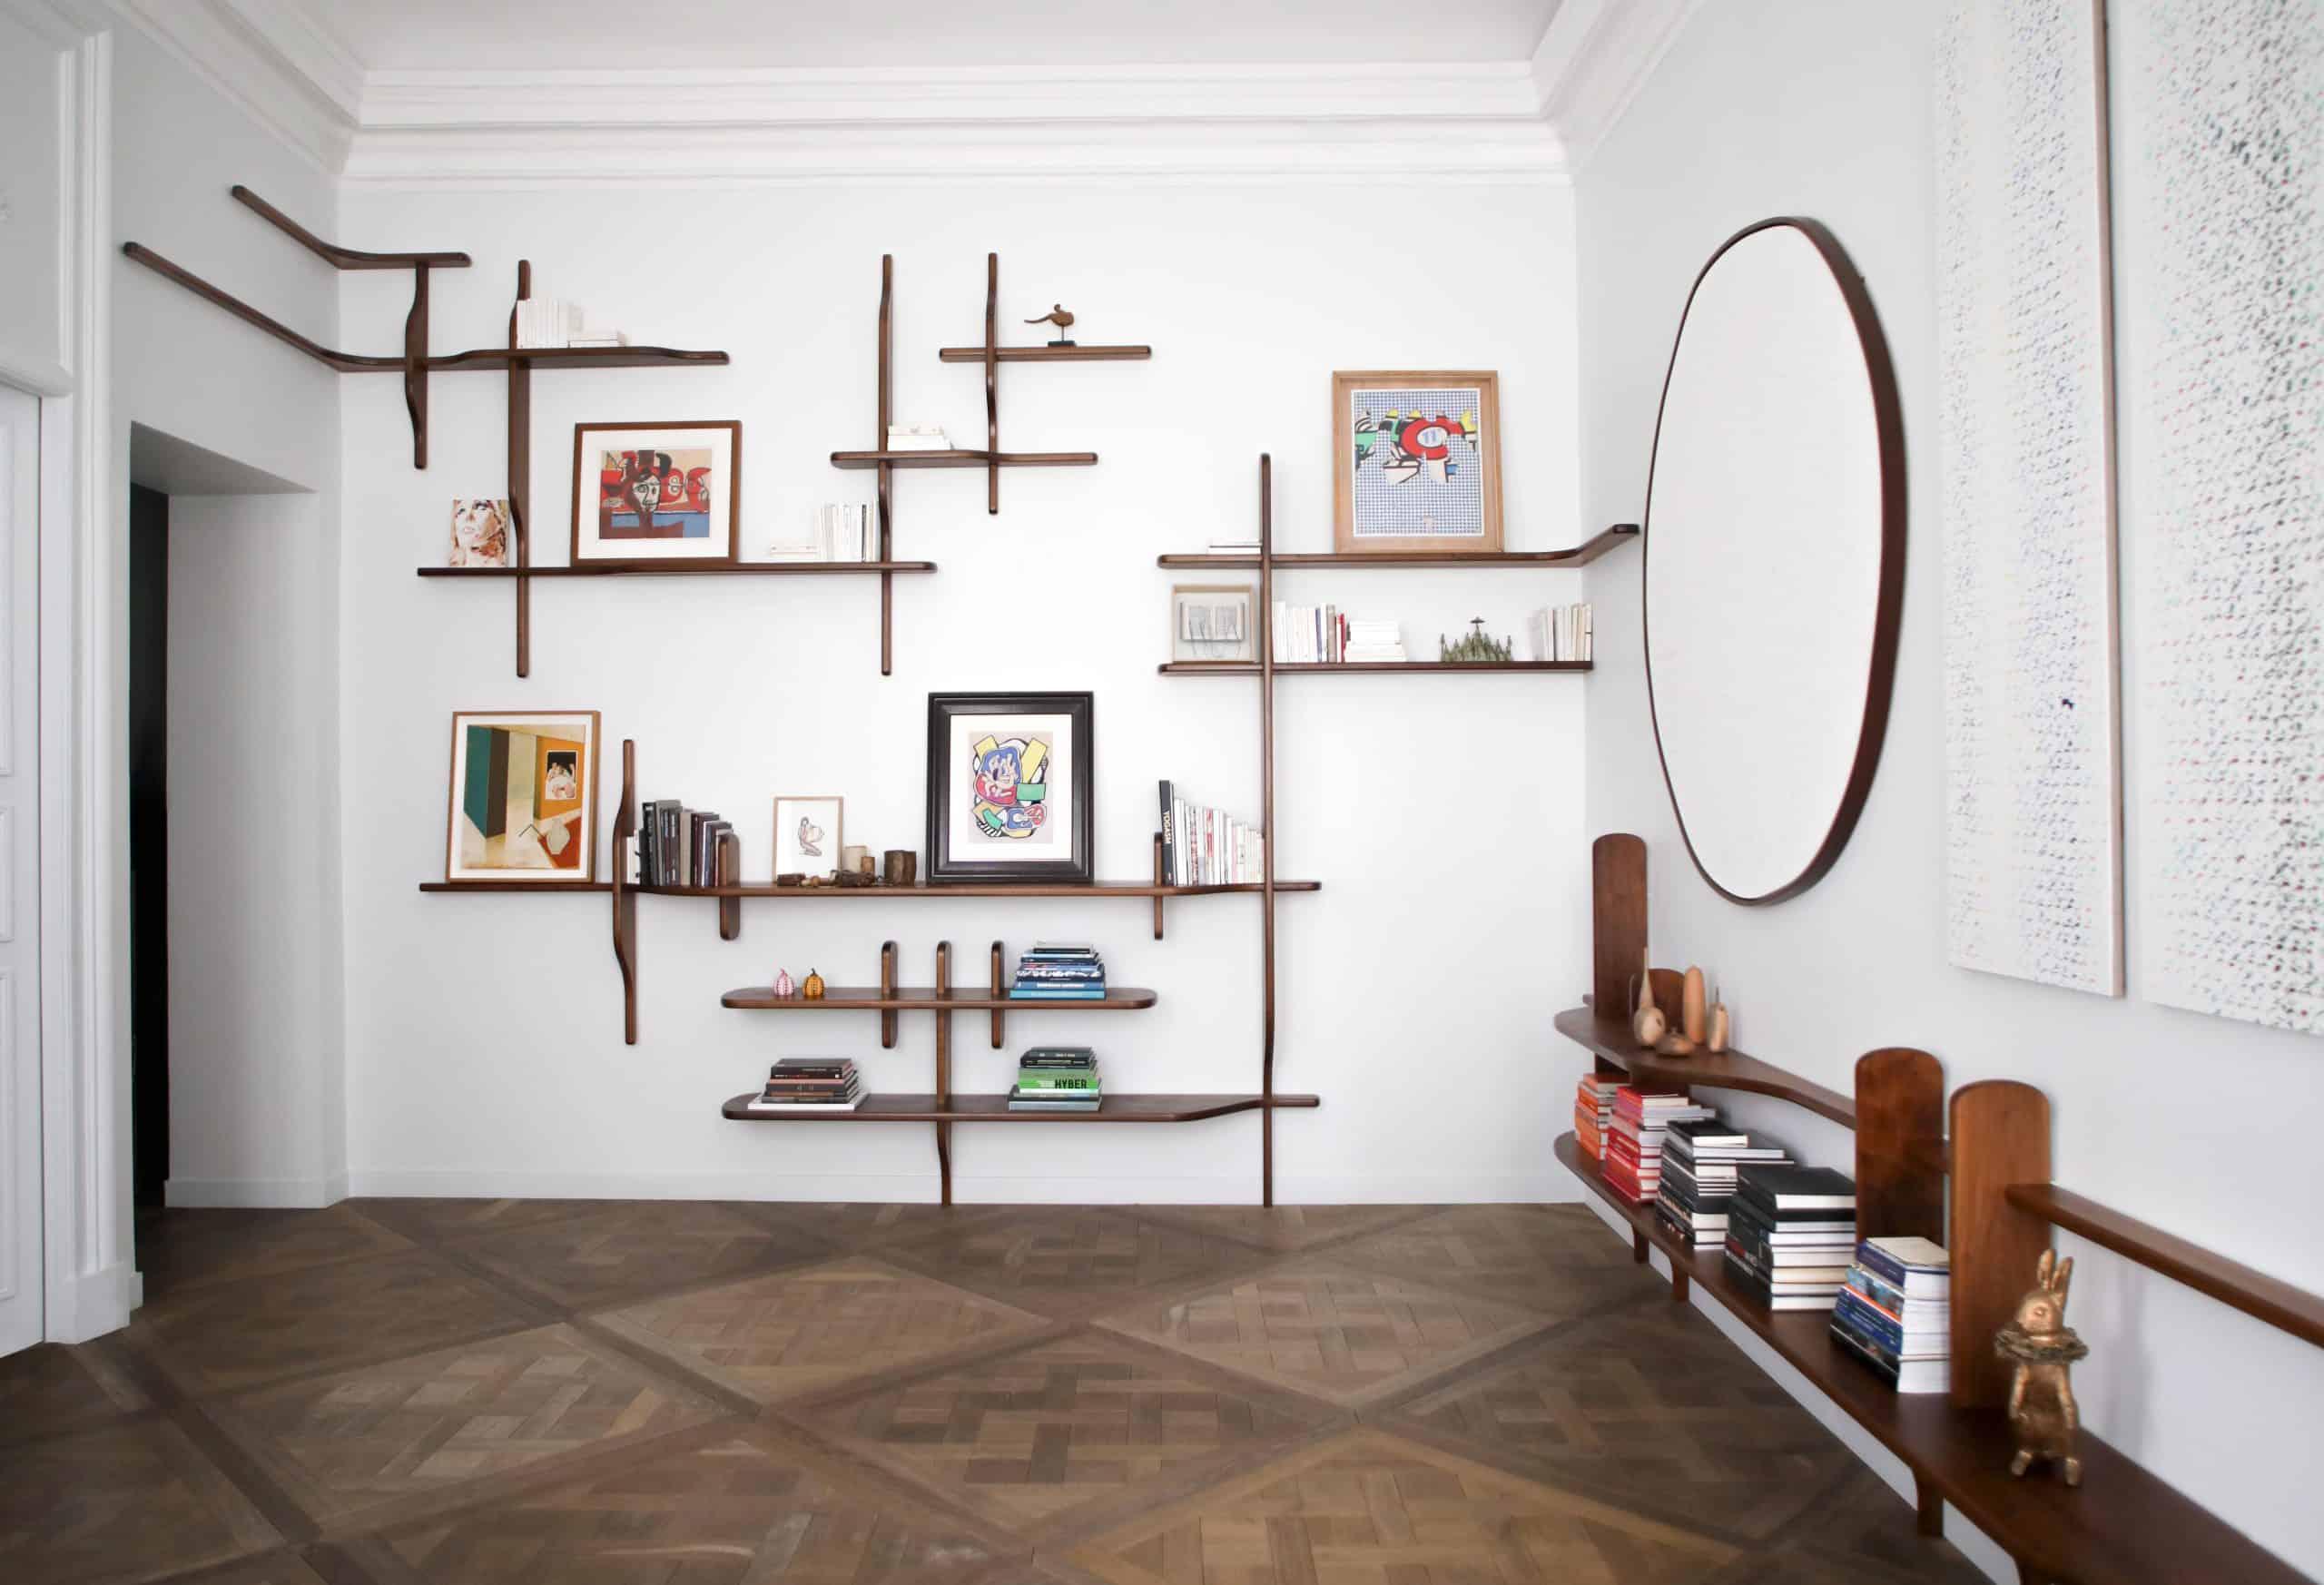 YMER&MALTA's custom Alphabet bookshelf